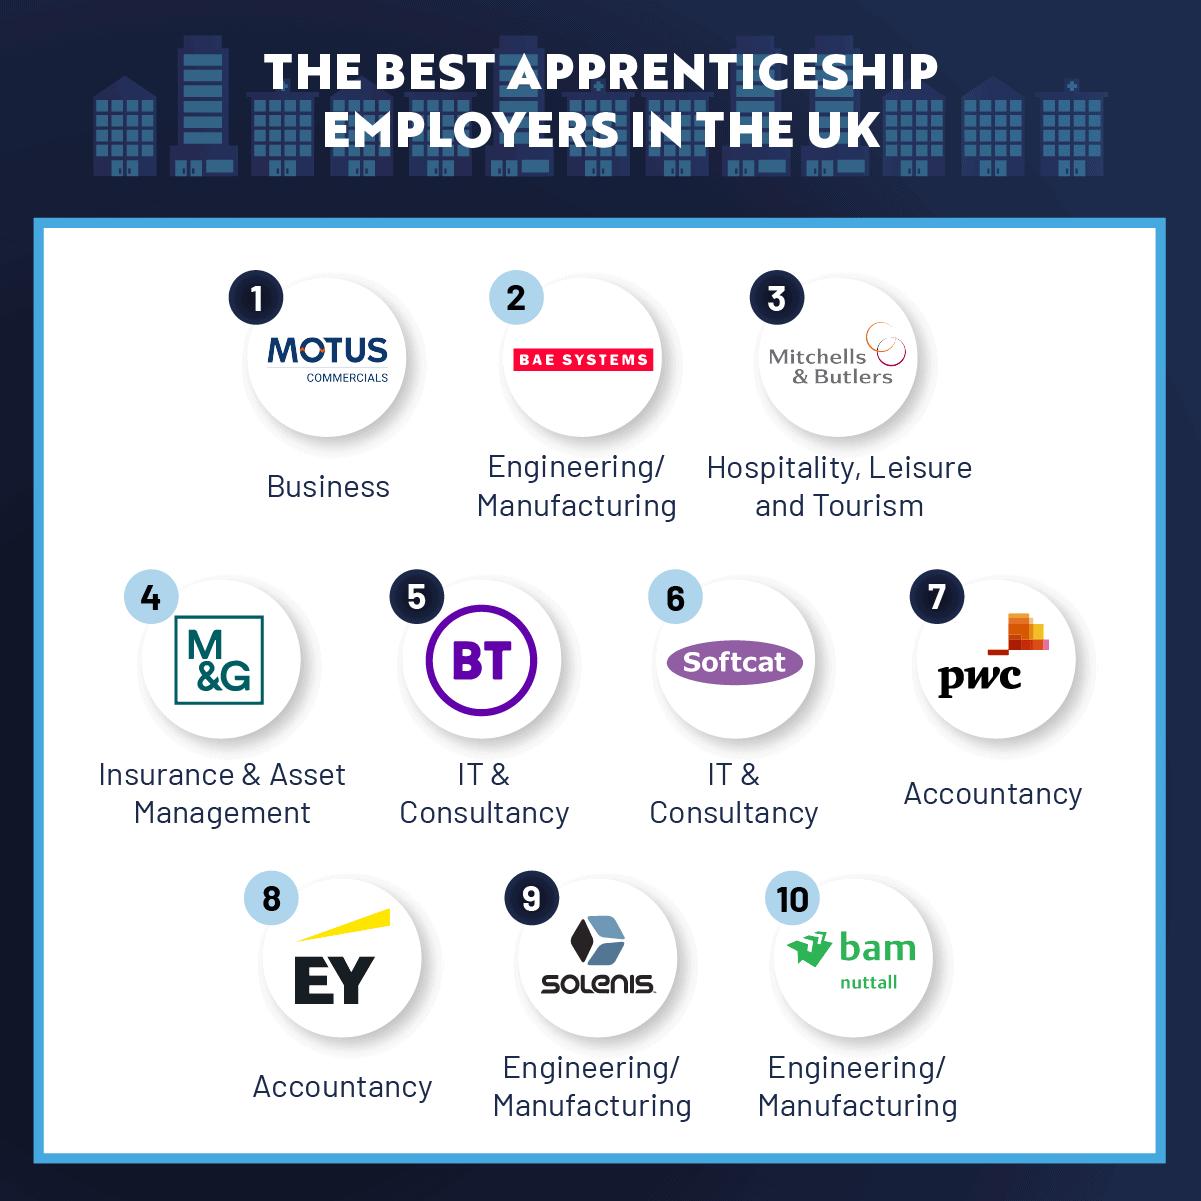 Best Apprenticeship employers in the UK